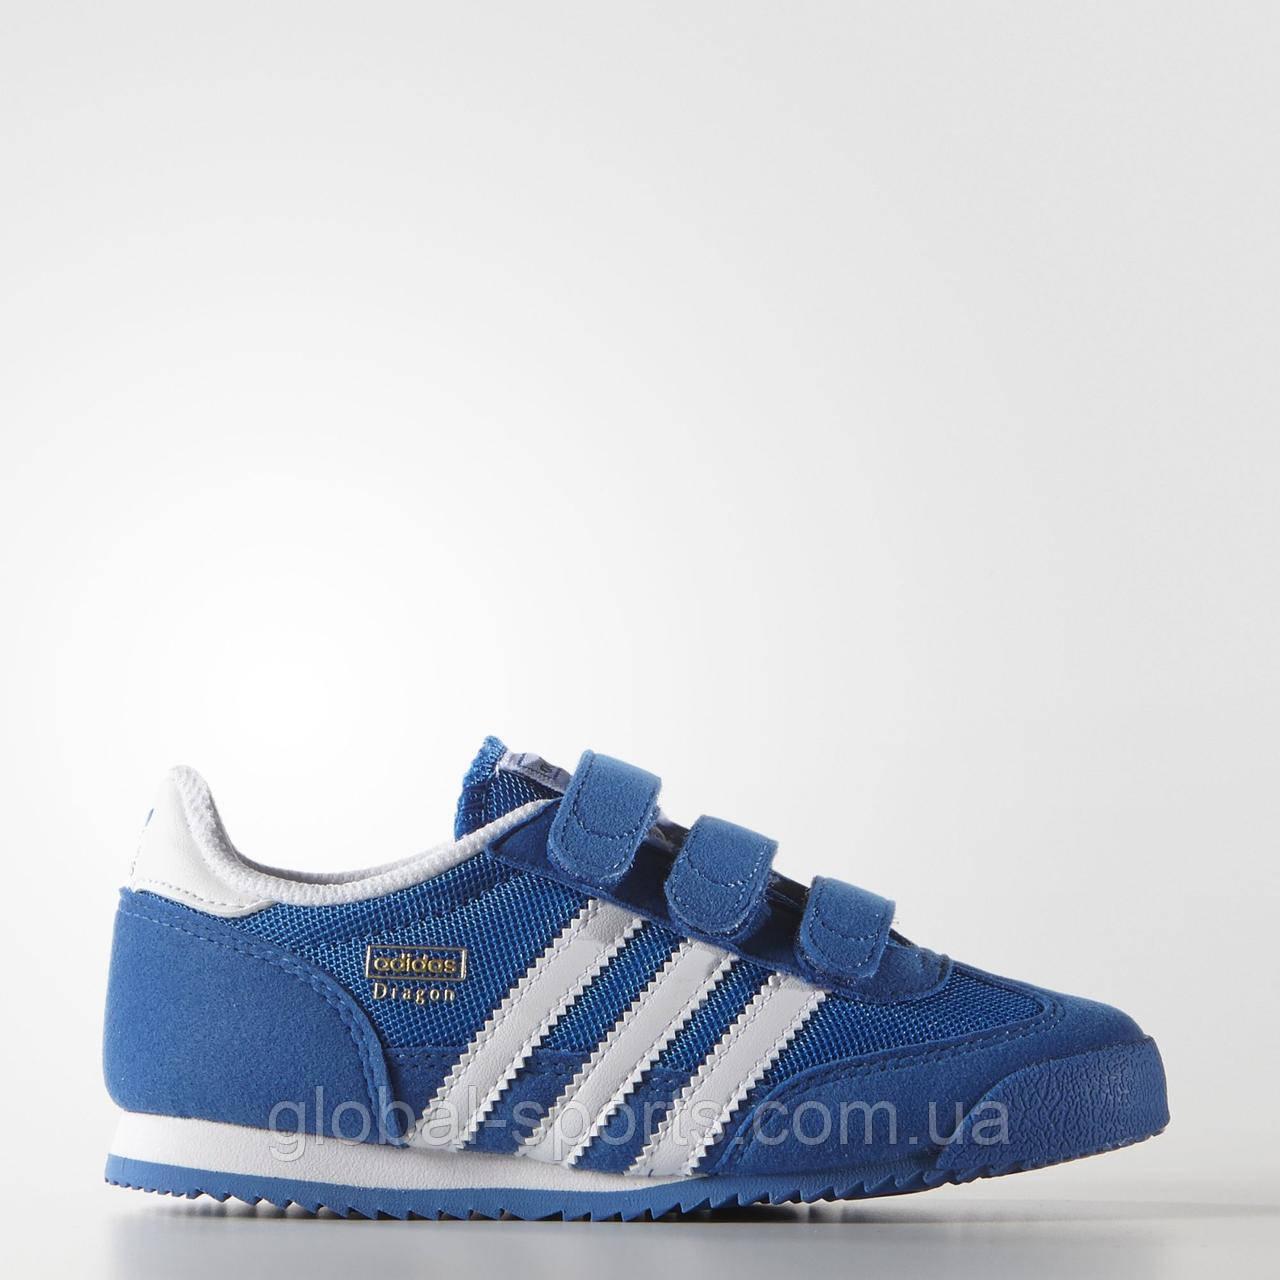 ea0f0df3 Детские кроссовки Adidas Dragon K (АРТИКУЛ:D67699) - магазин Global Sport в  Харькове